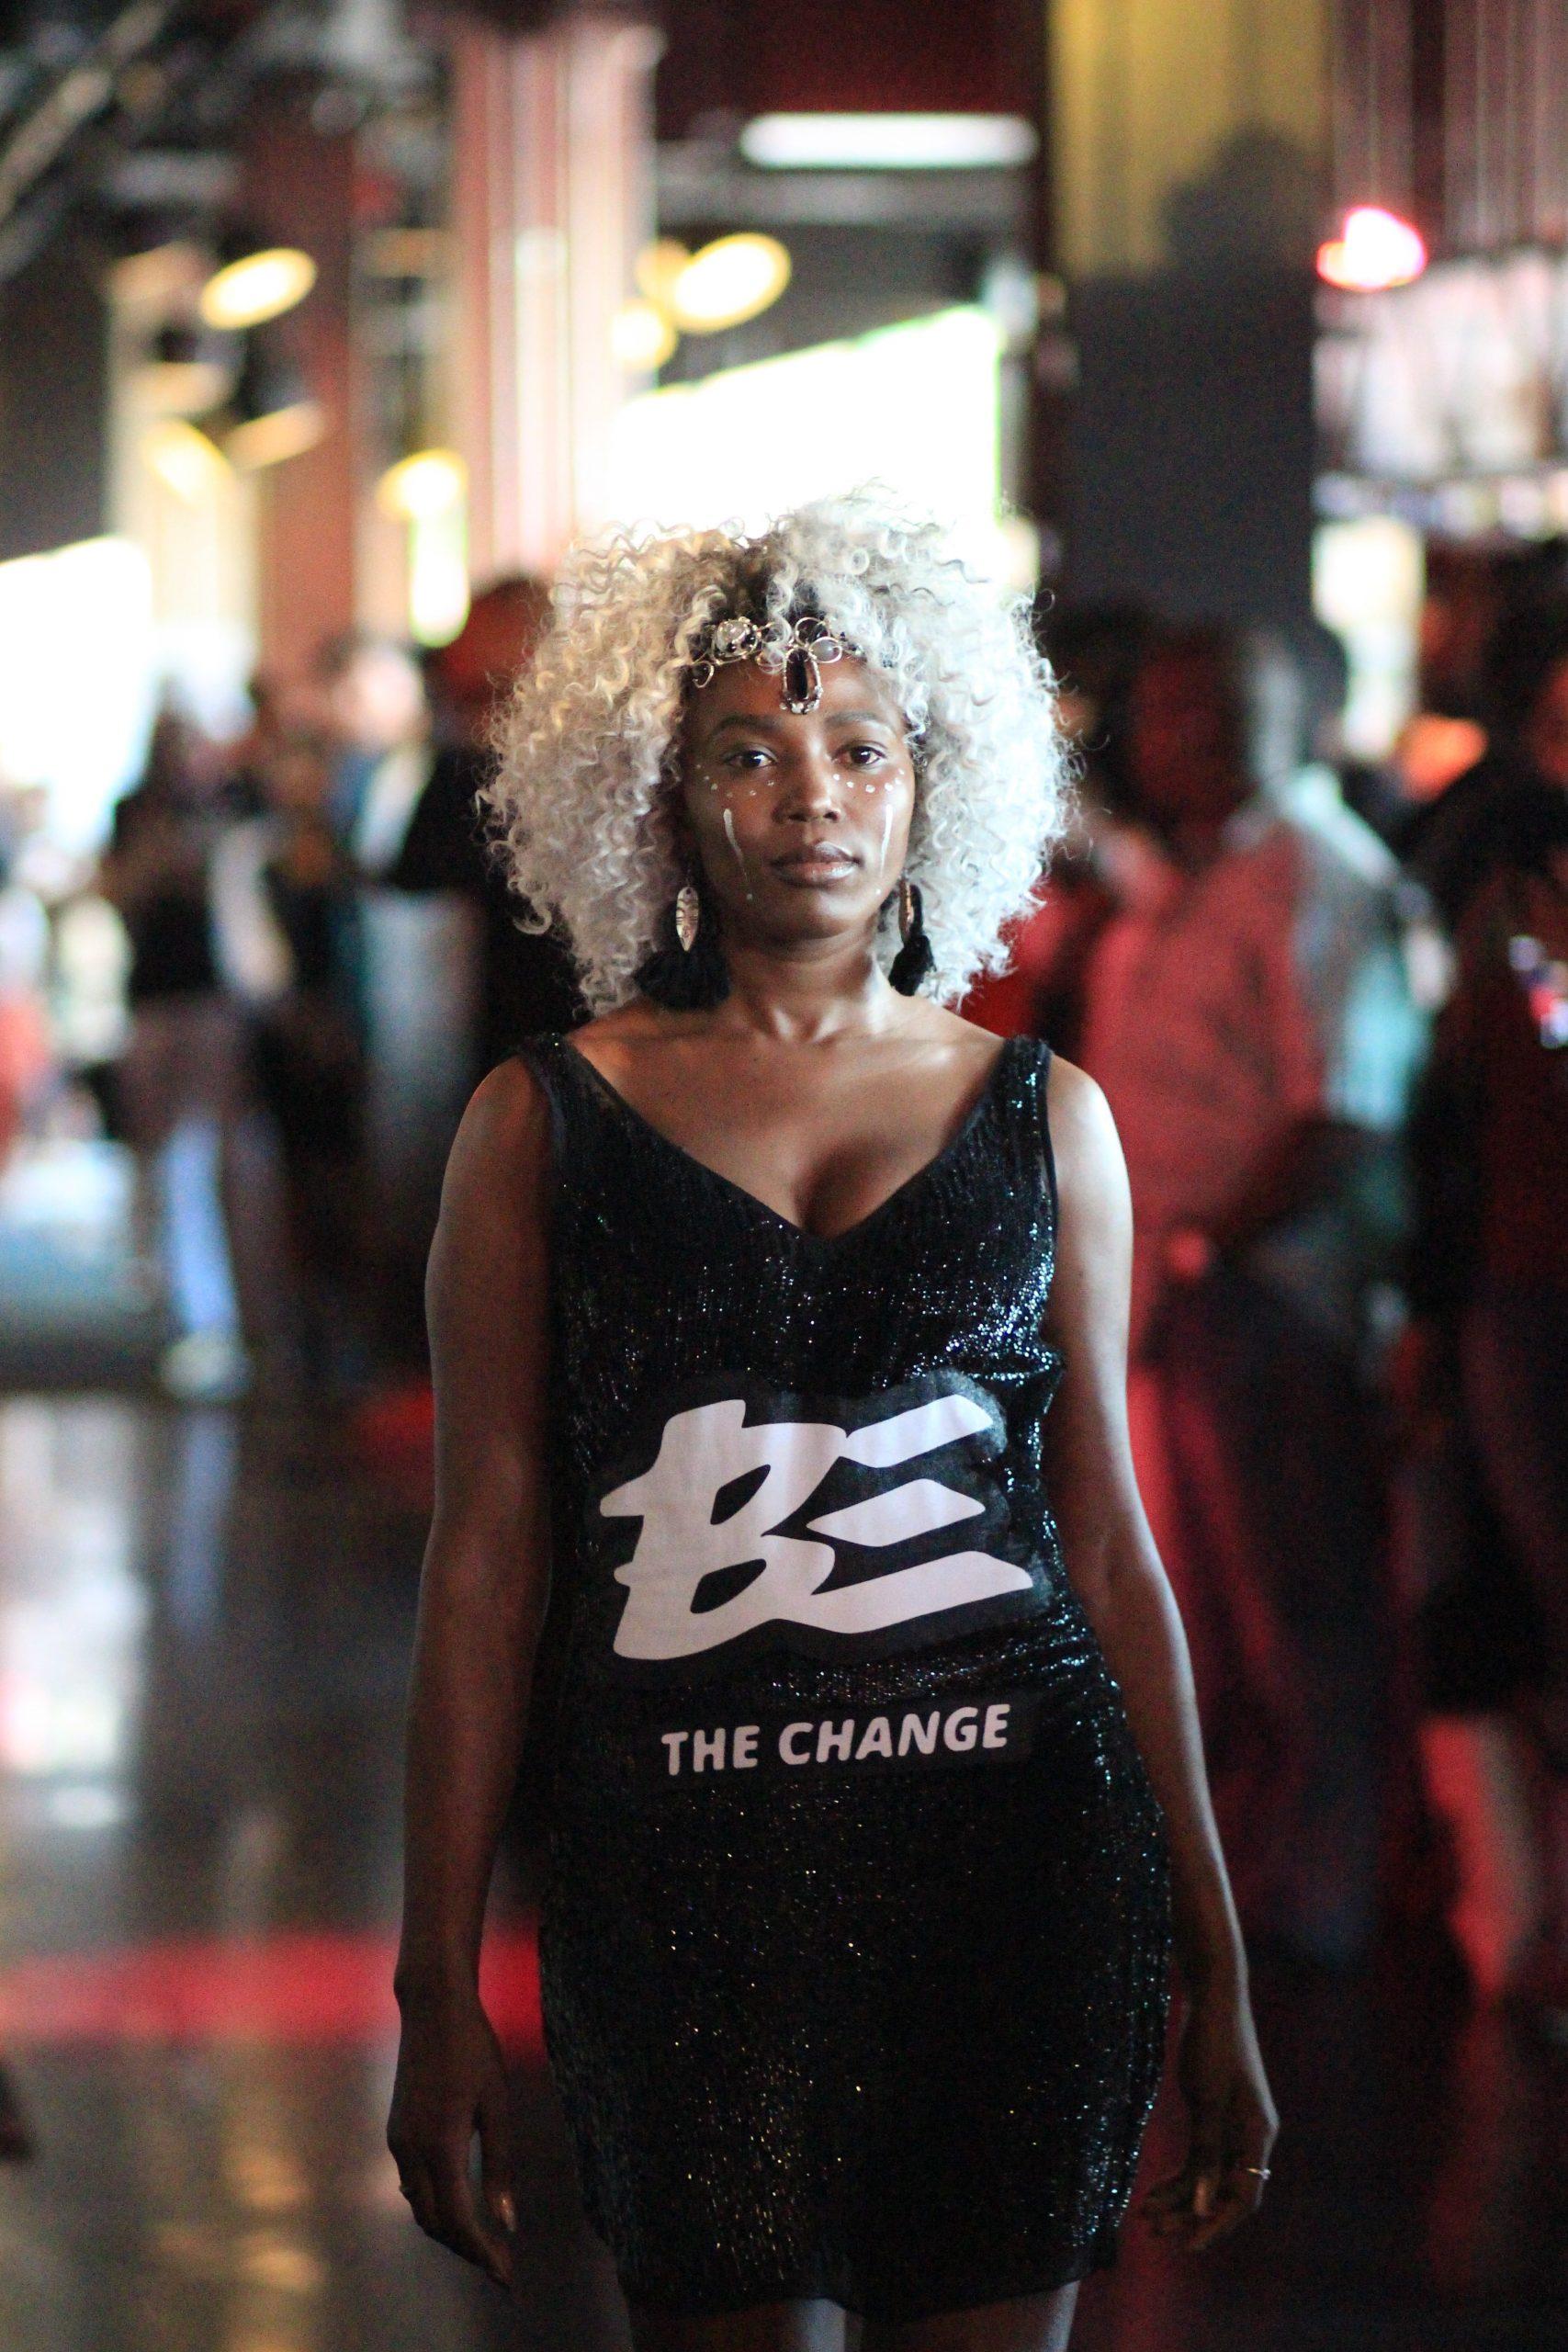 Still from a fashion show at the inaugural Black Fashion Week MN